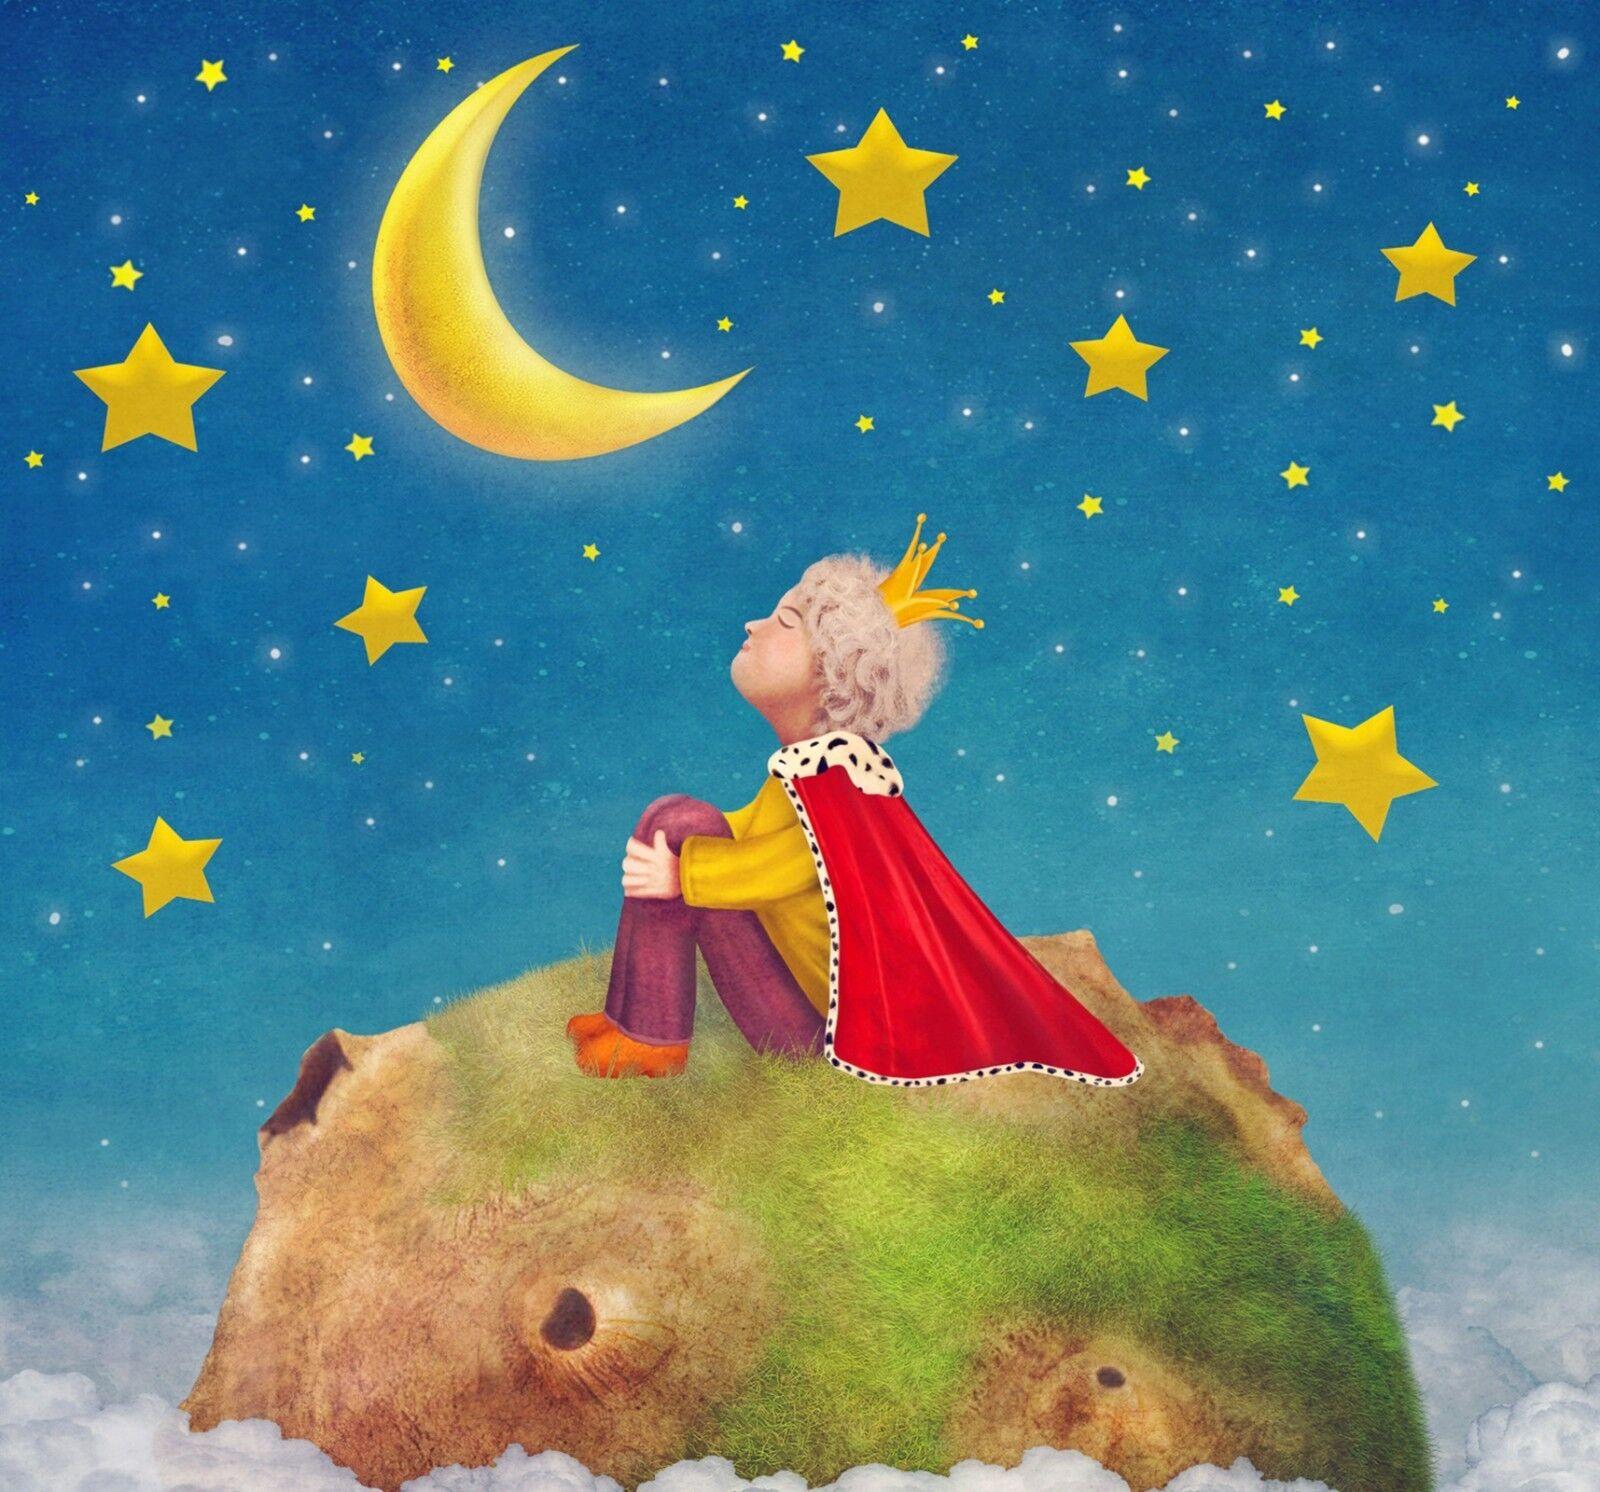 3D Prinz Mond Sterne 9083 Tapete Wandgemälde Tapeten Bild Bild Bild Familie DE Lemon | Qualität Produkt  |  79aef5